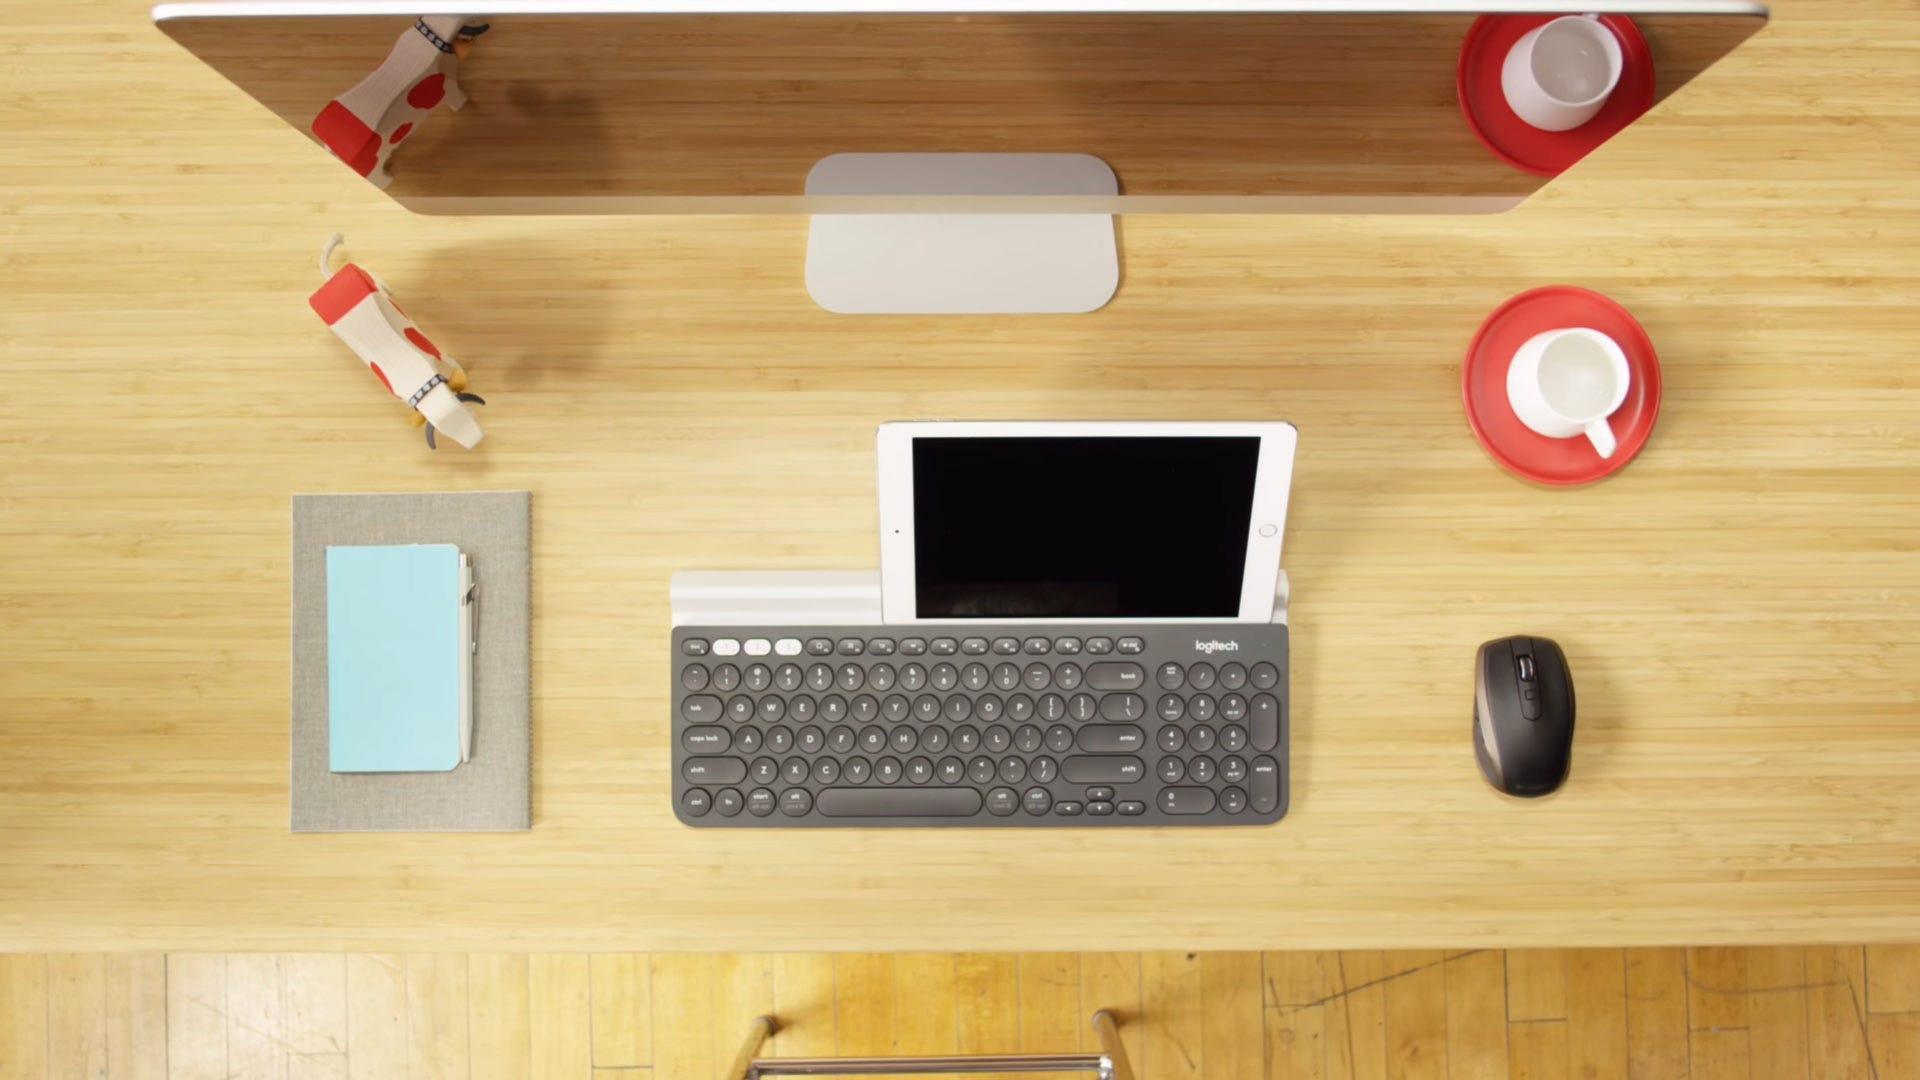 Color : Yellow Wireless Keyboard and Mouse Set Desktop Laptop Universal External Keyboard Mouse Wireless Mini Portable